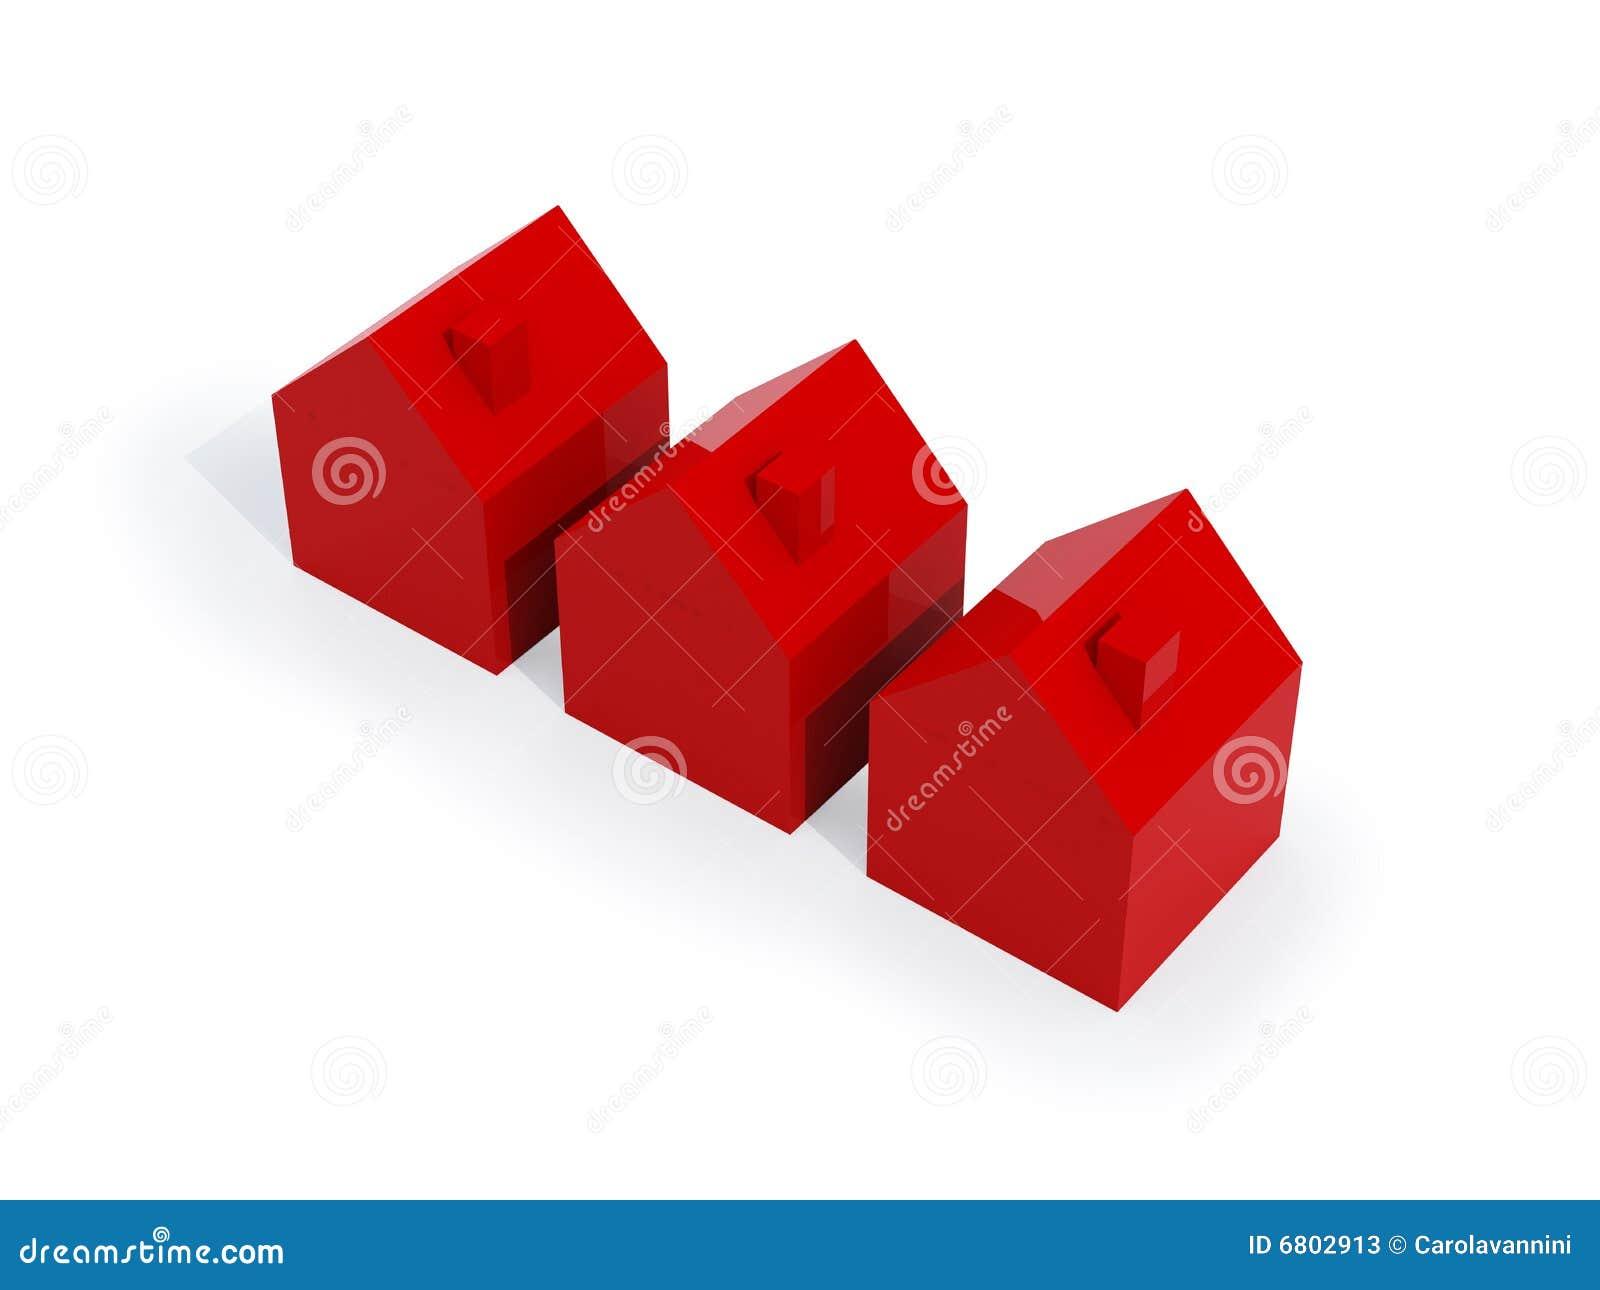 Arquitectura de casas pequenas tattoo design bild - Diseno de casas pequenas ...